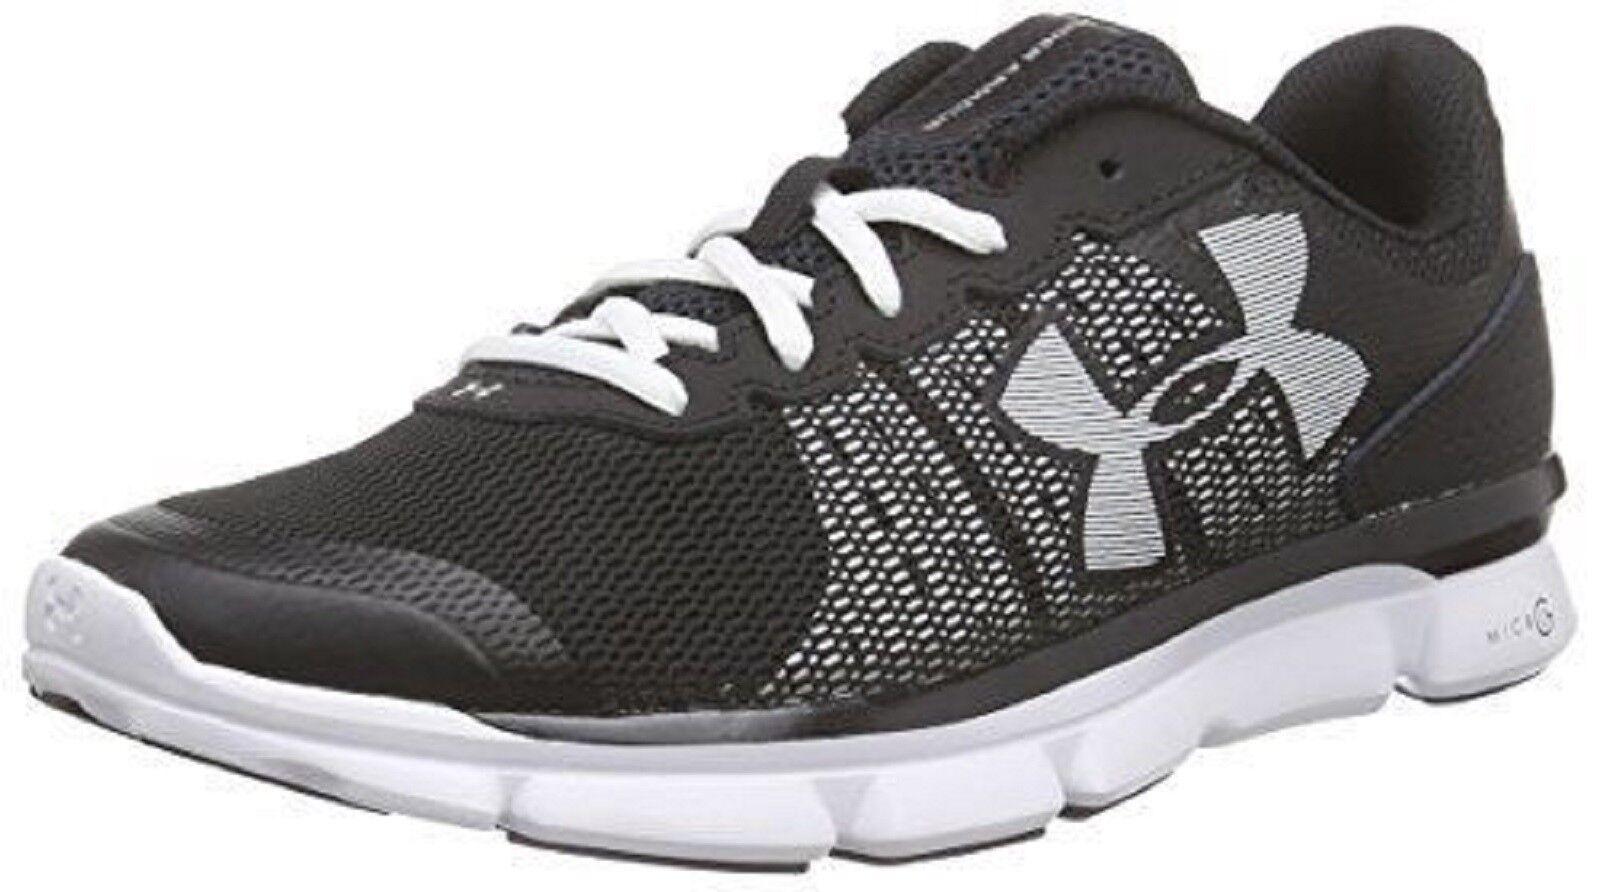 UNDER ARMOUR femmes  'MICRO G SPEED SWIFT' Running Shoe  noir / blanc  Sz. 7.5 M NIB